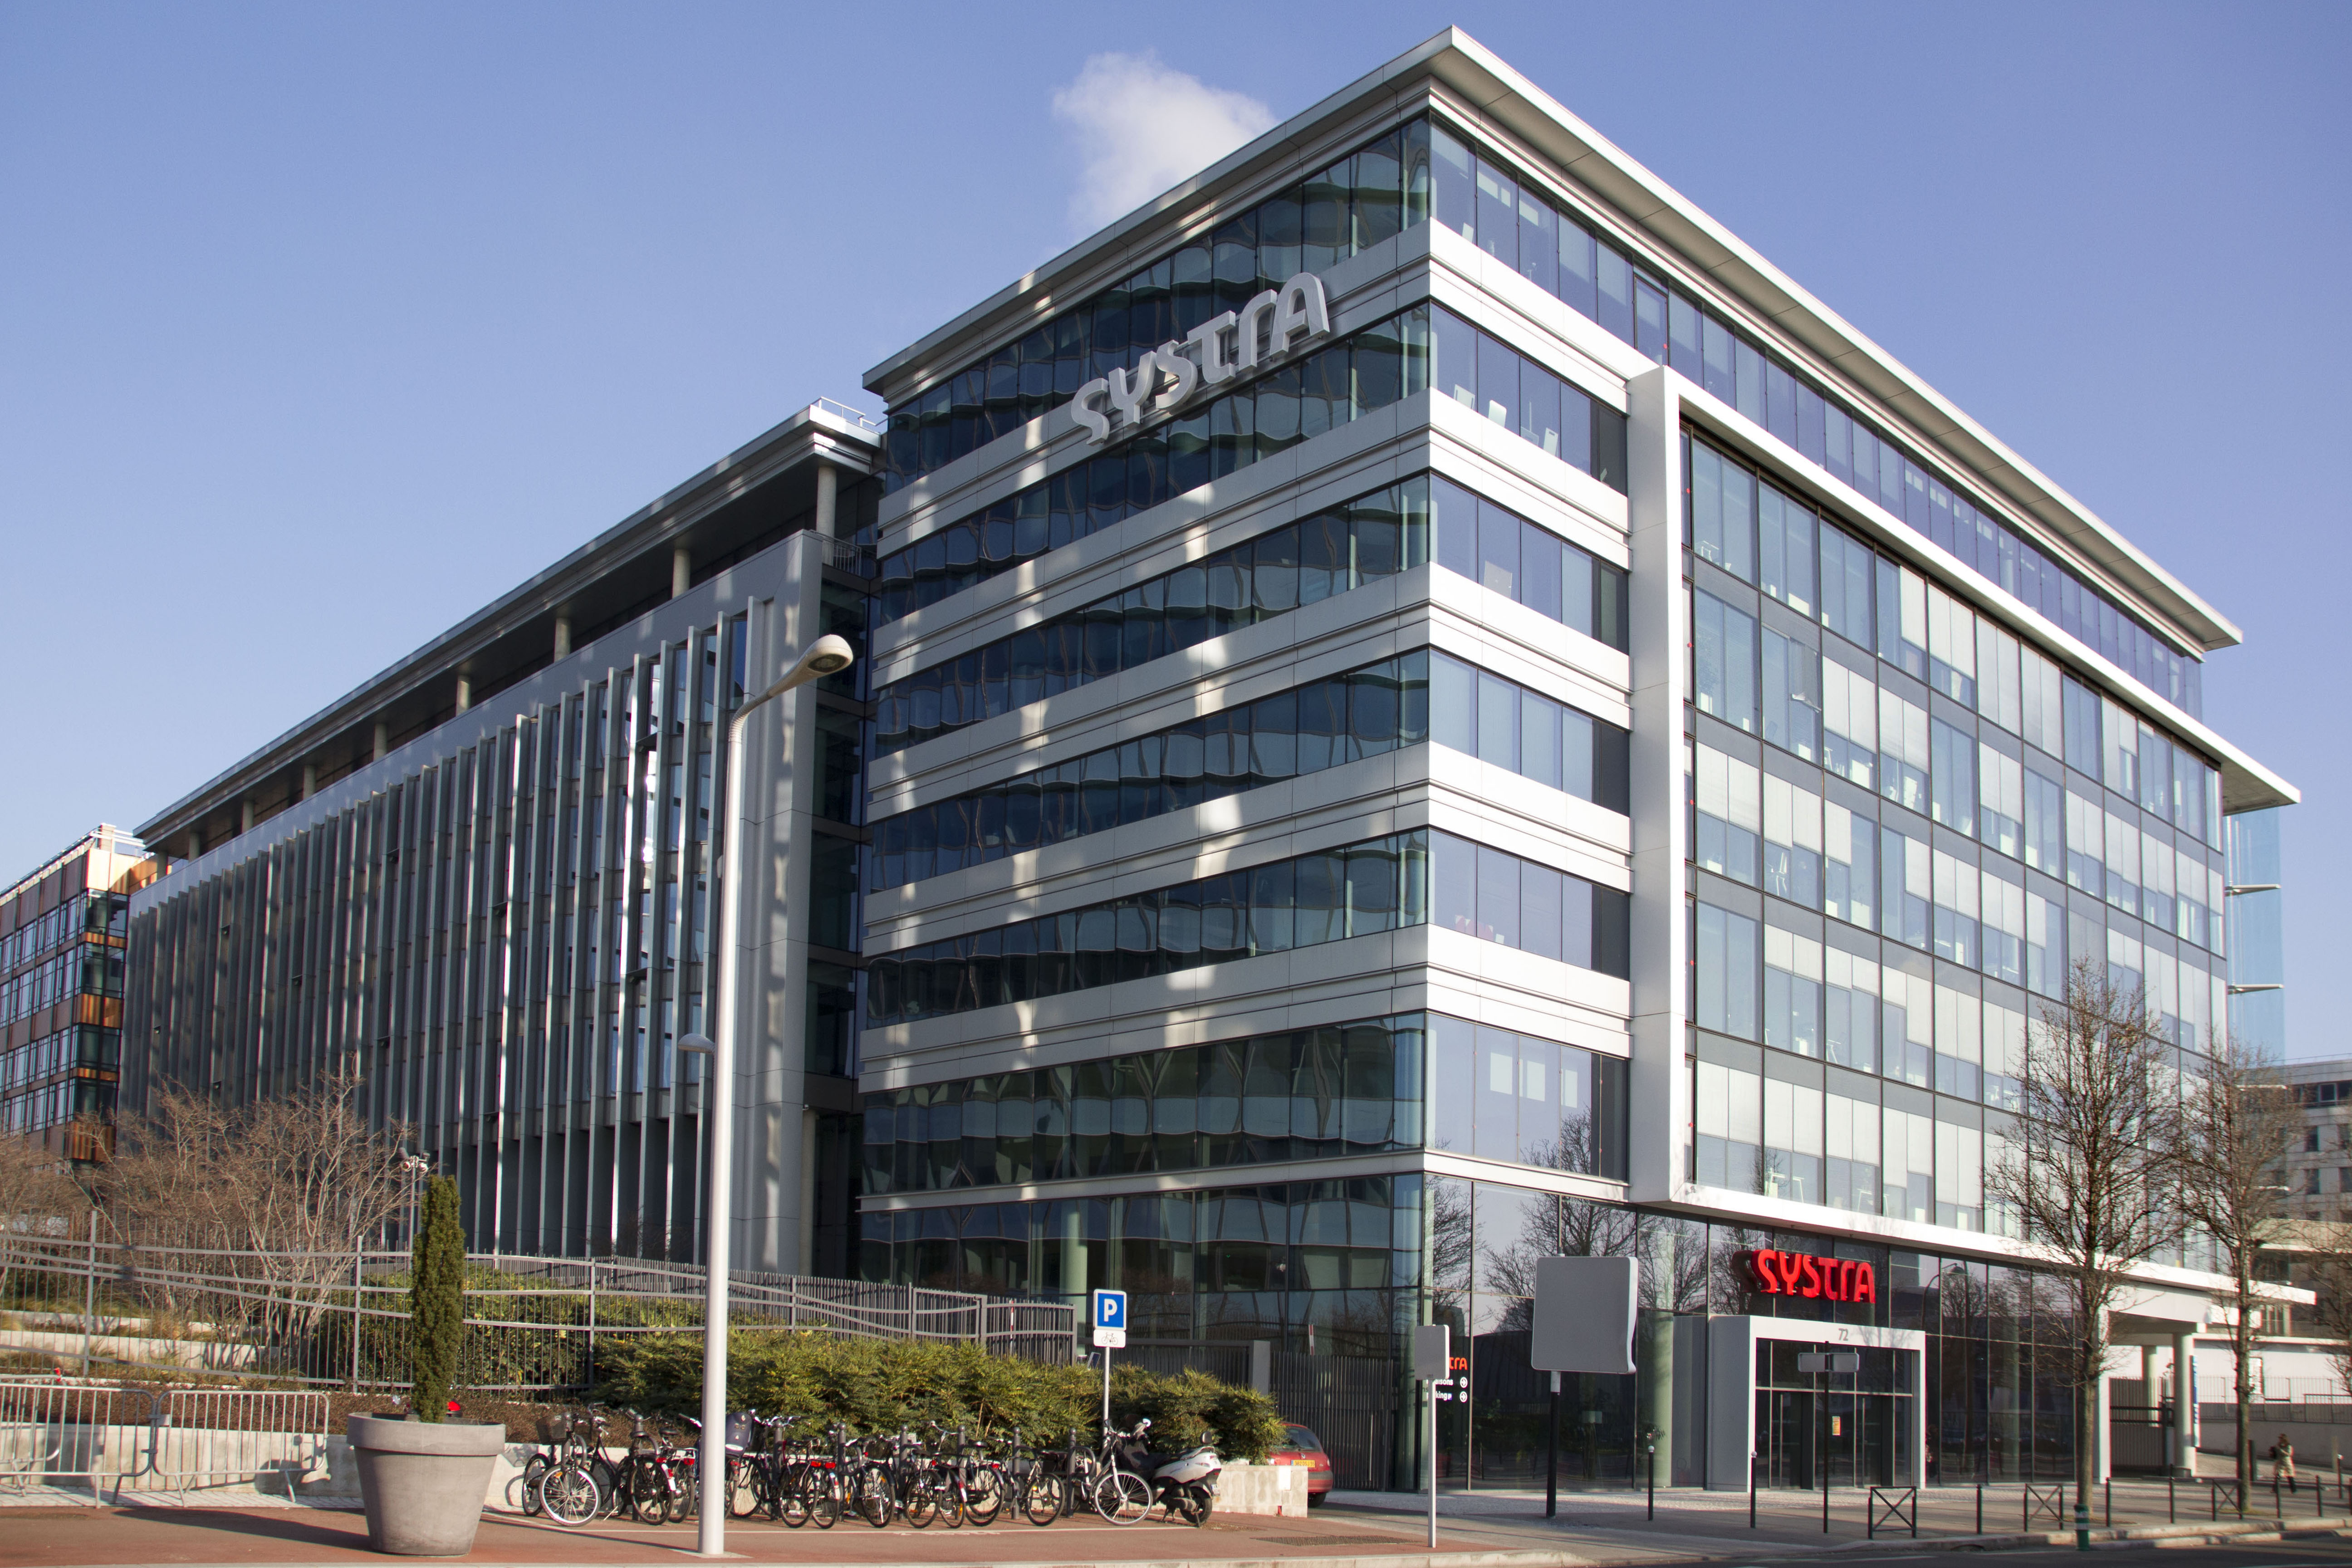 Entreprise D Architecture Lyon systra - wikipedia